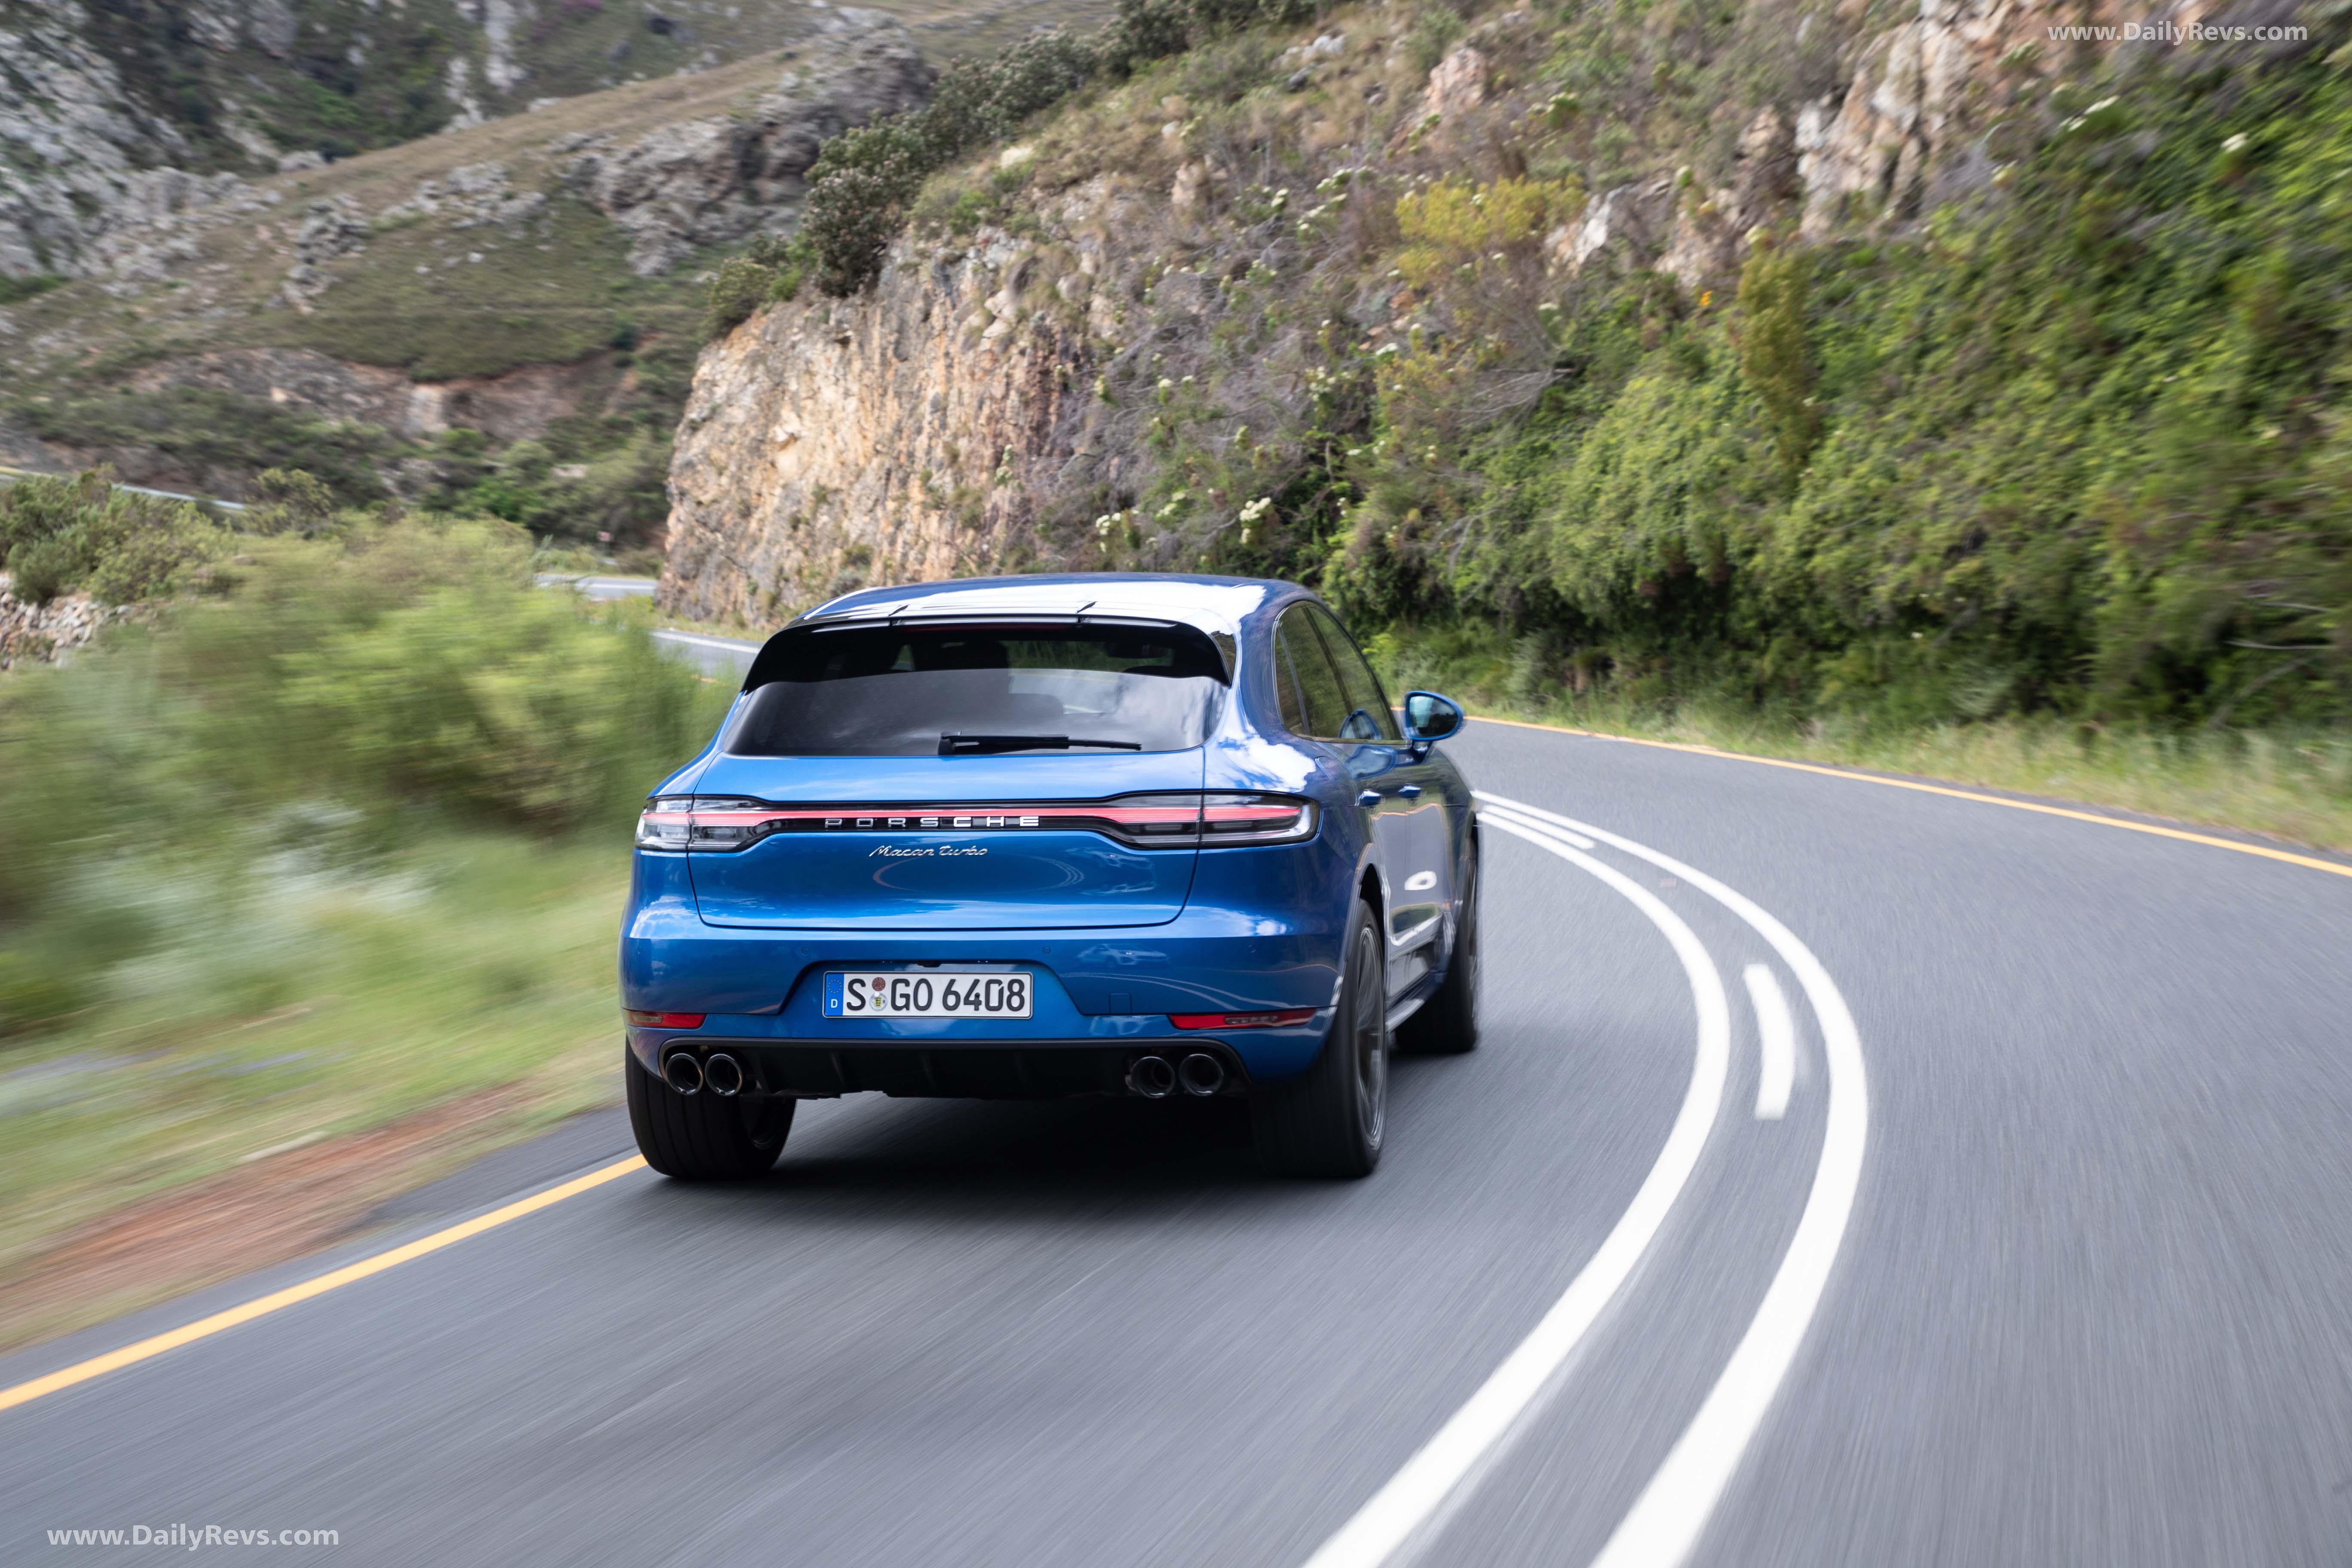 2019 Porsche Macan Turbo - HQ Pictures, Specs, Information ...